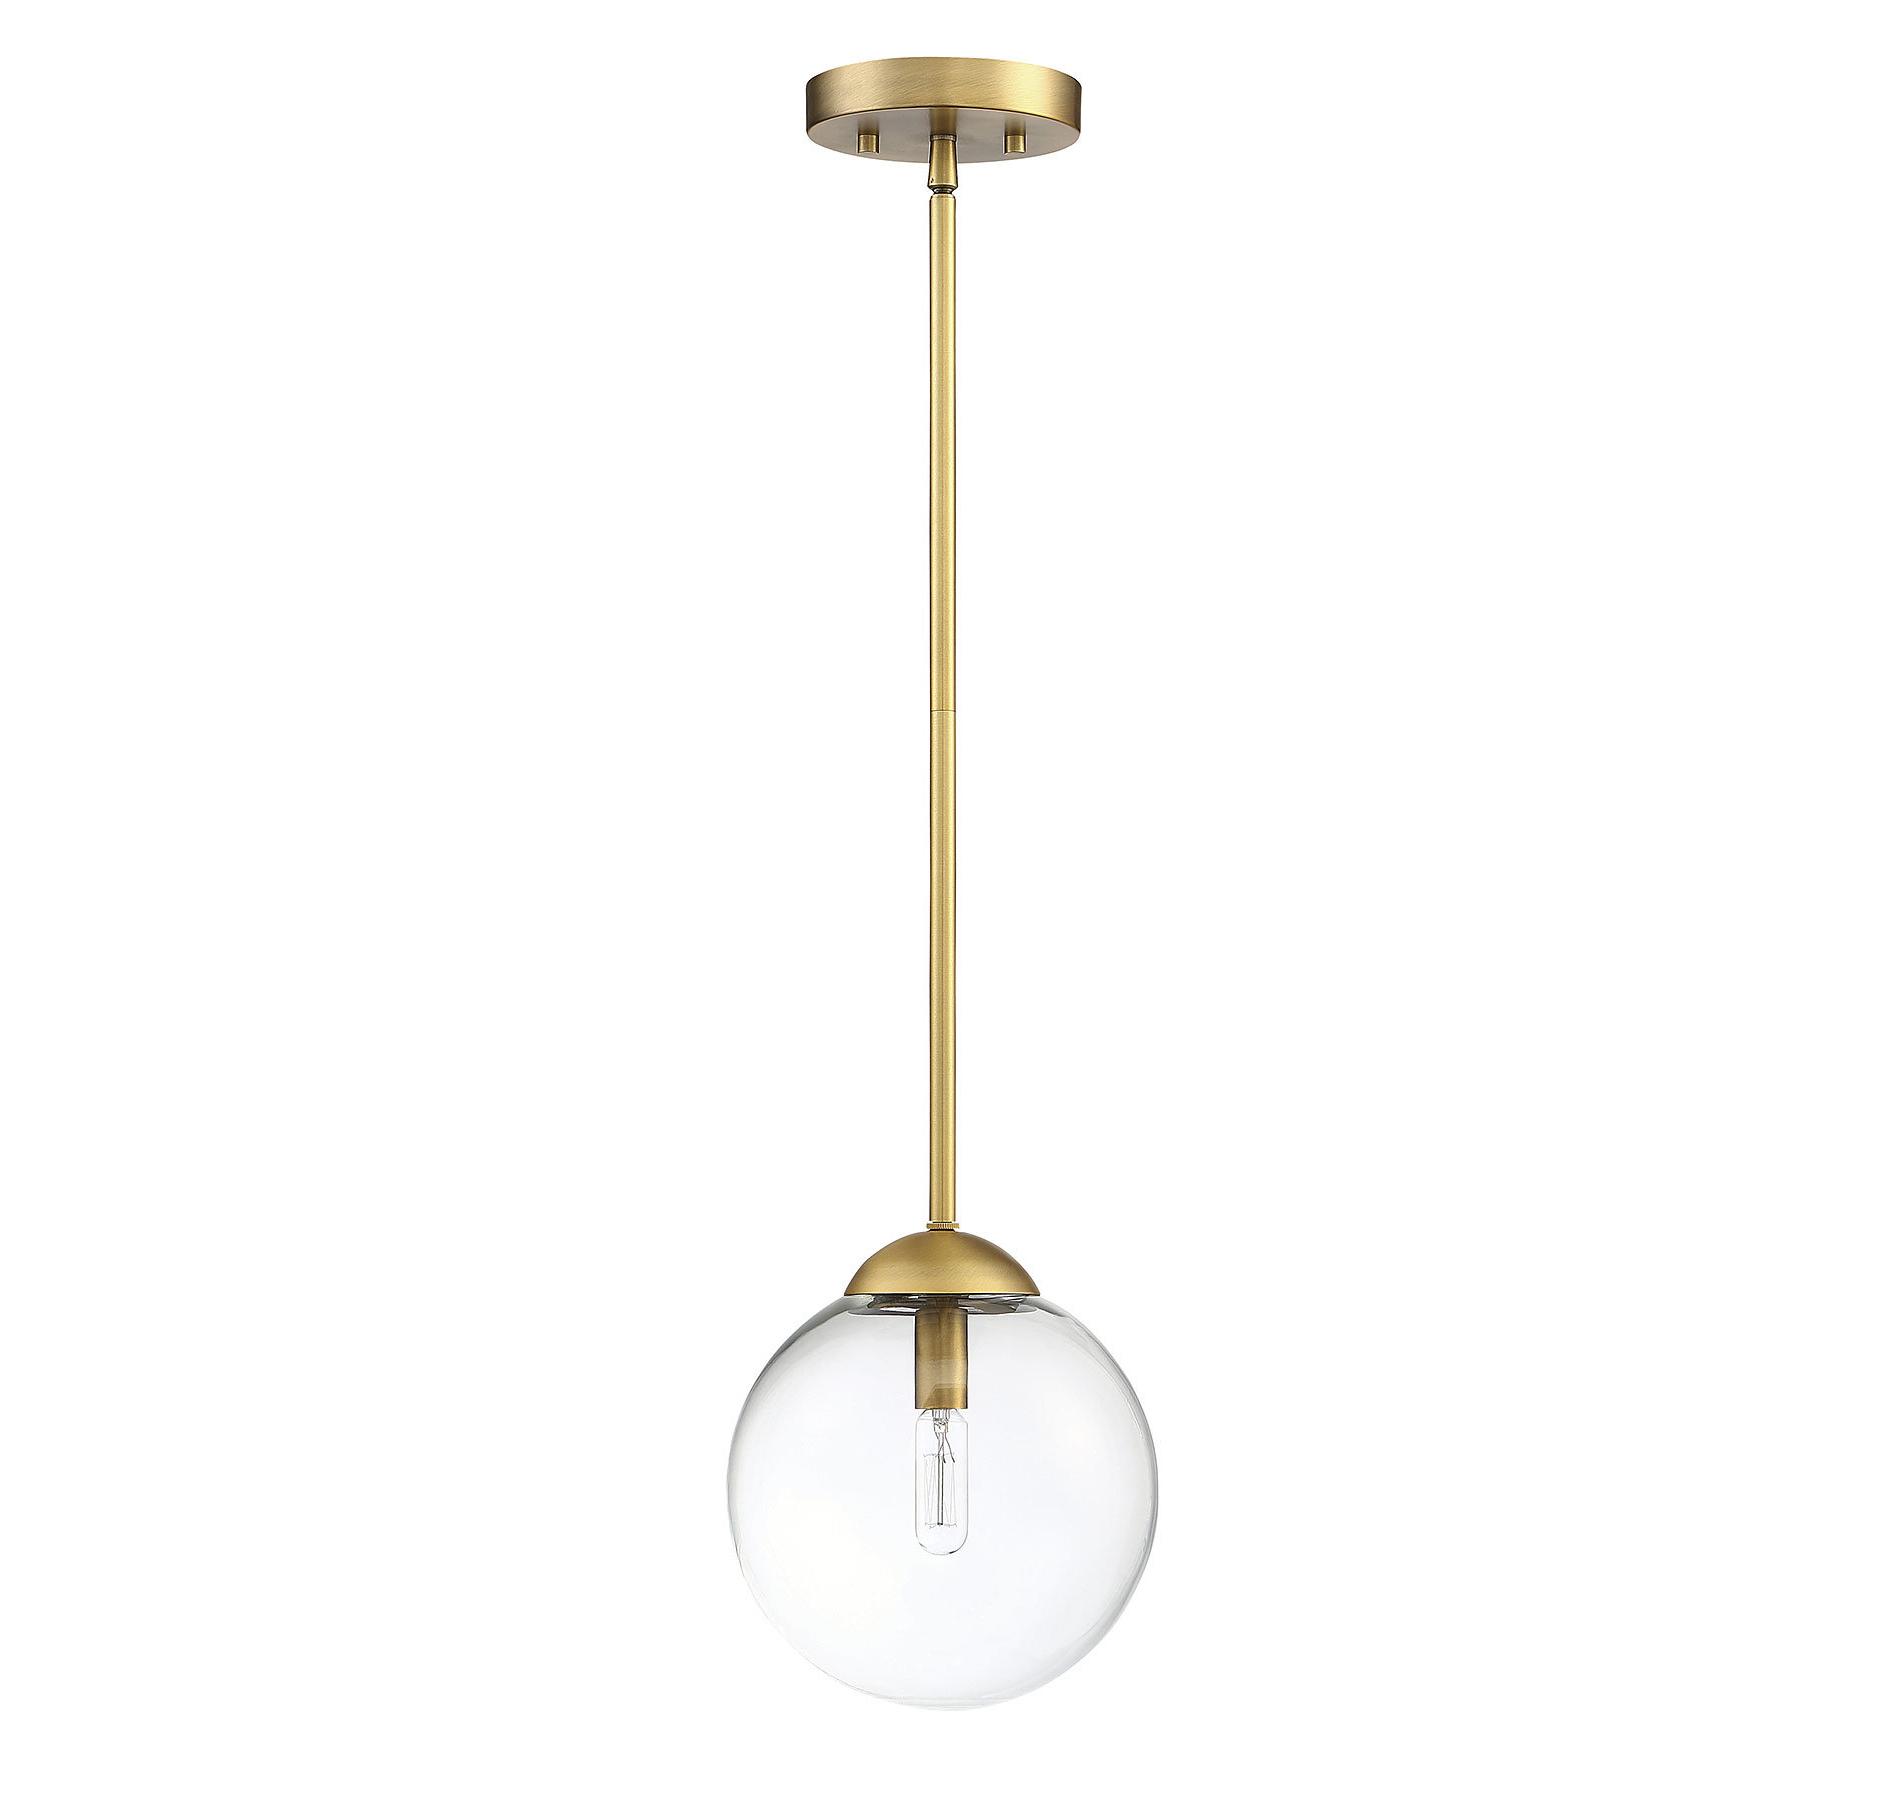 Cayden 1 Light Single Globe Pendants Regarding Popular St Judes 1 Light Single Globe Pendant (View 6 of 20)